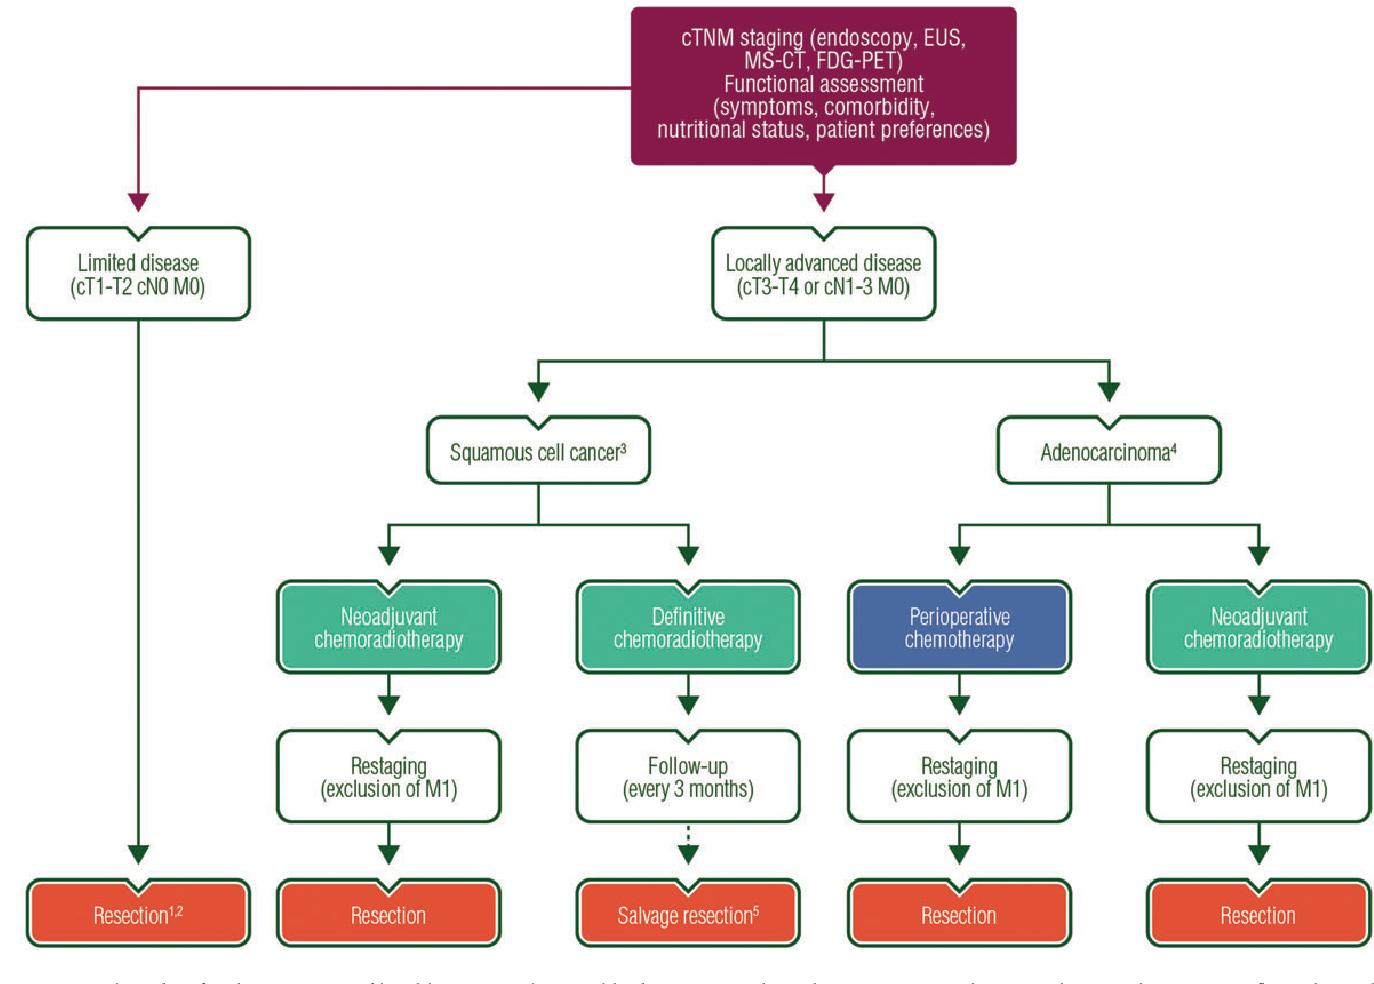 gastric cancer guideline esmo papillomavirus et urticaire